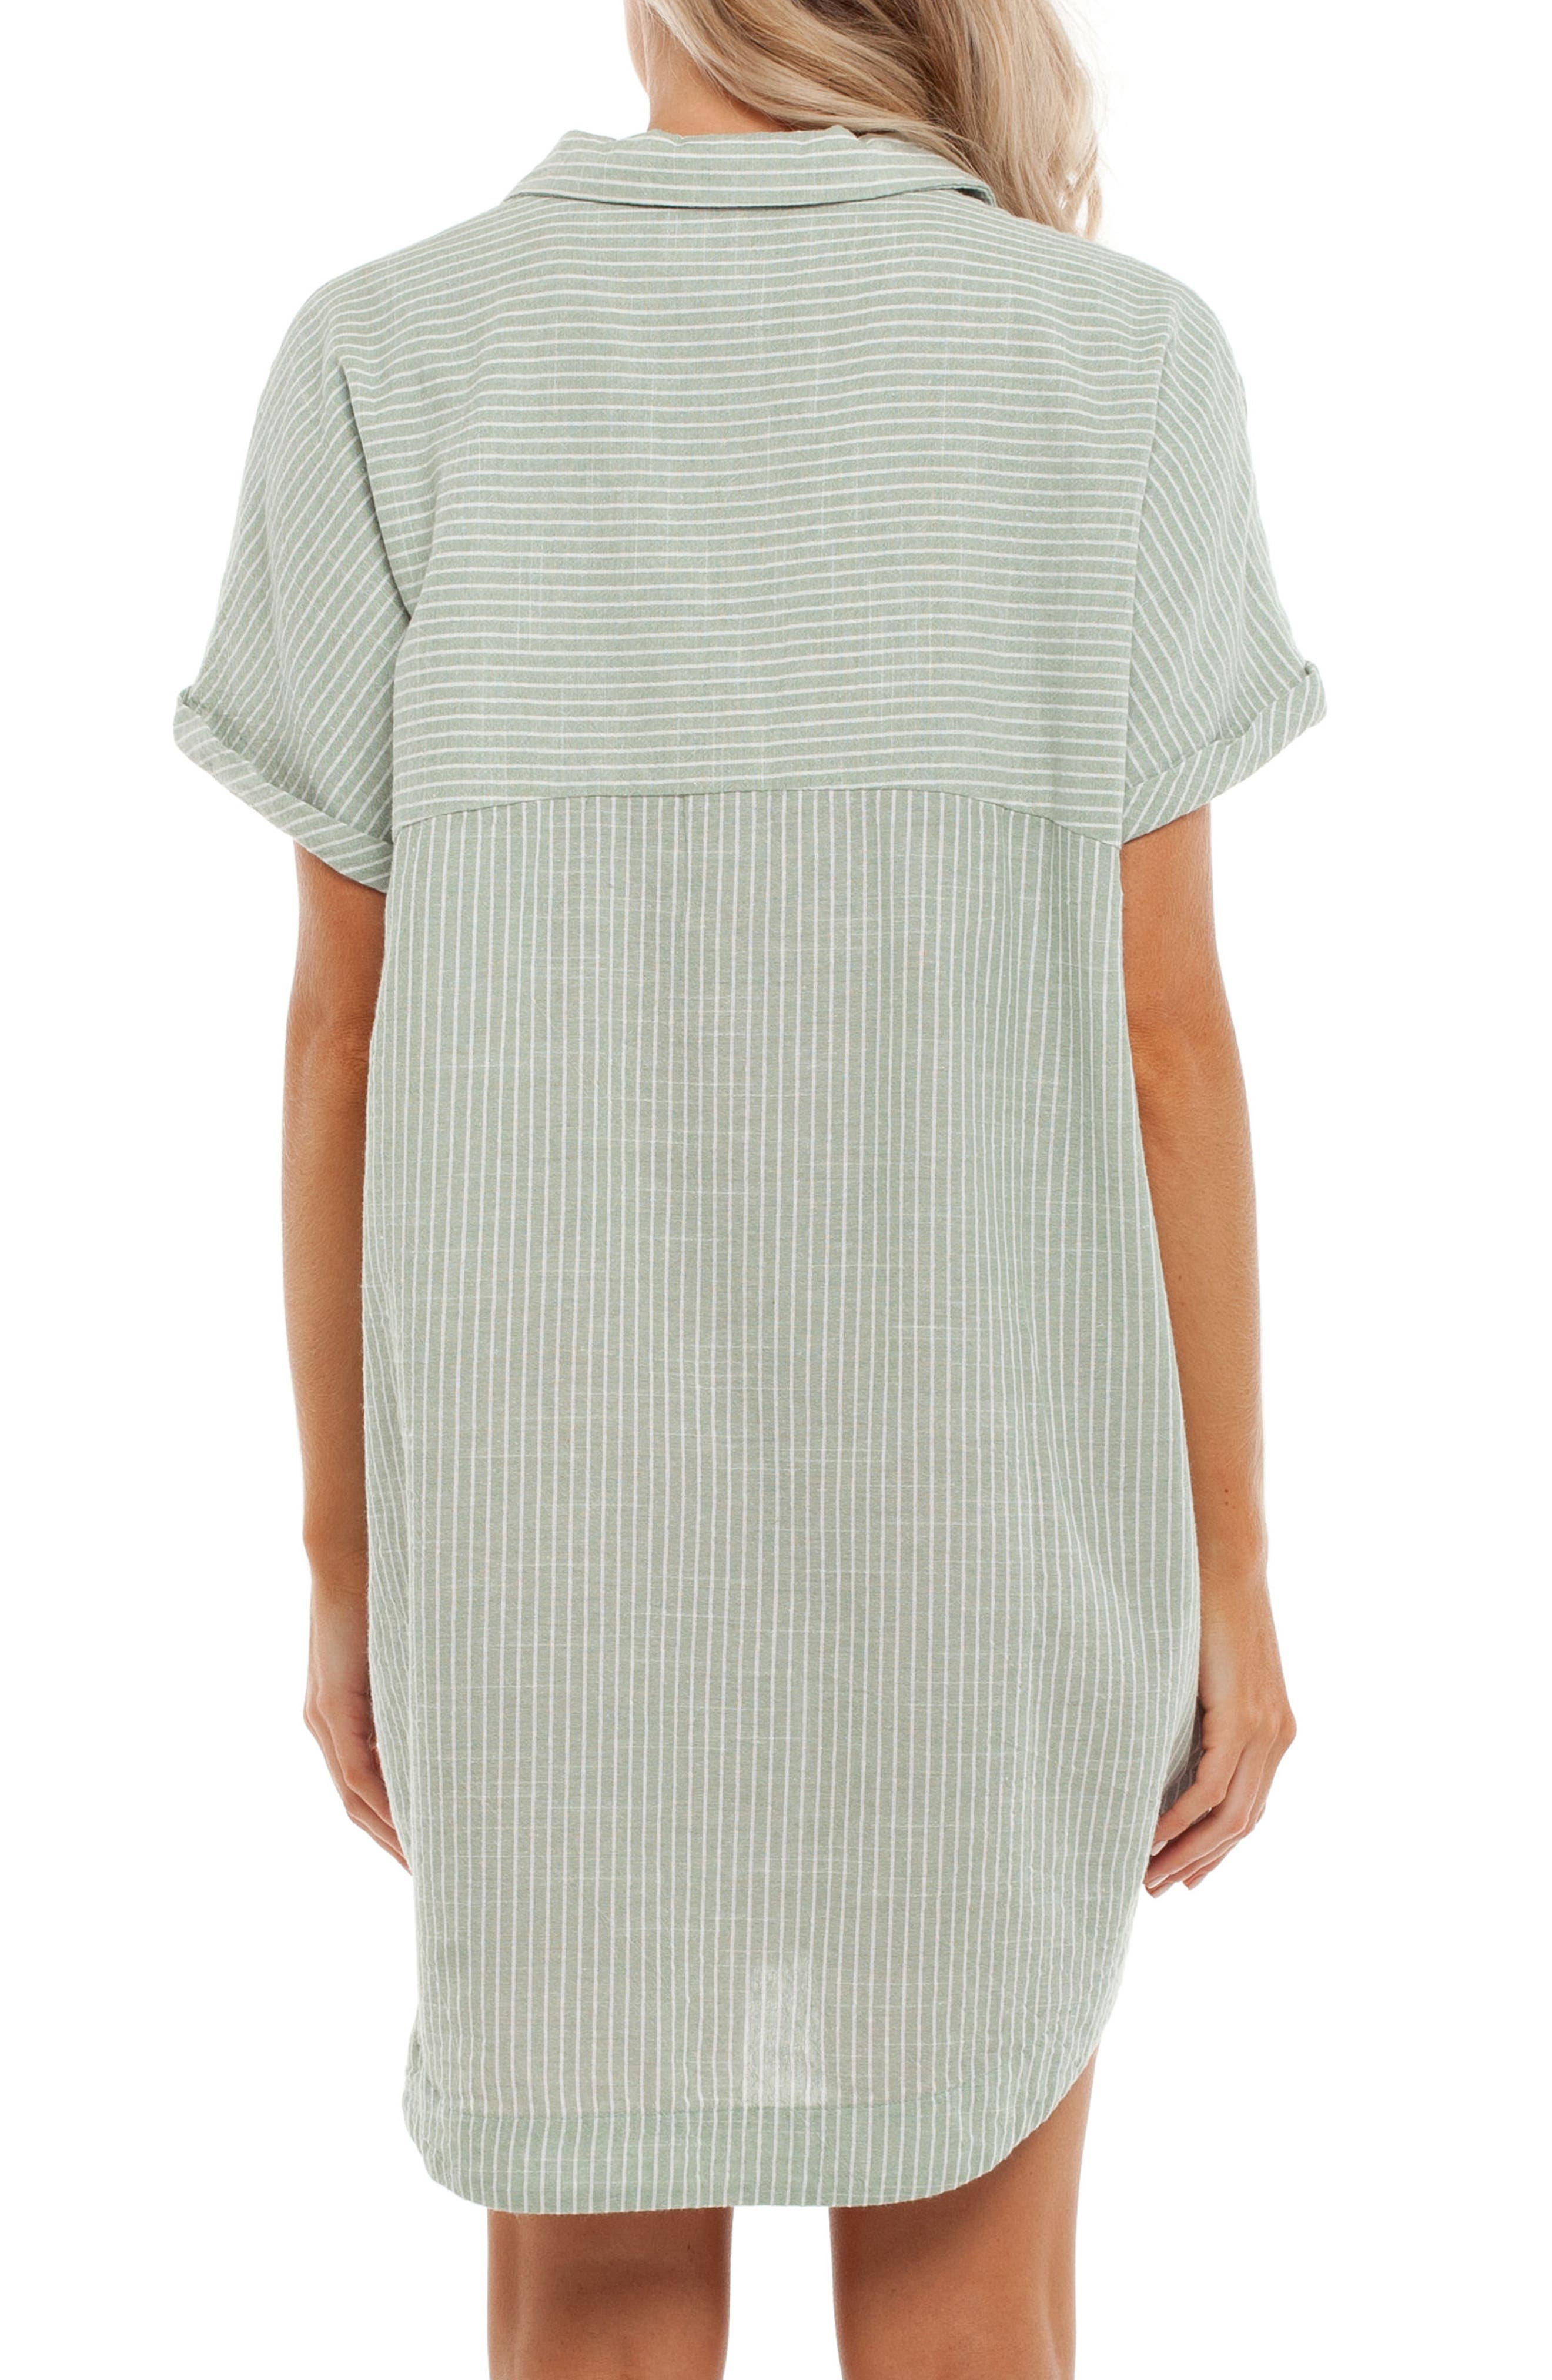 Seaside Cover-Up Dress,                             Alternate thumbnail 2, color,